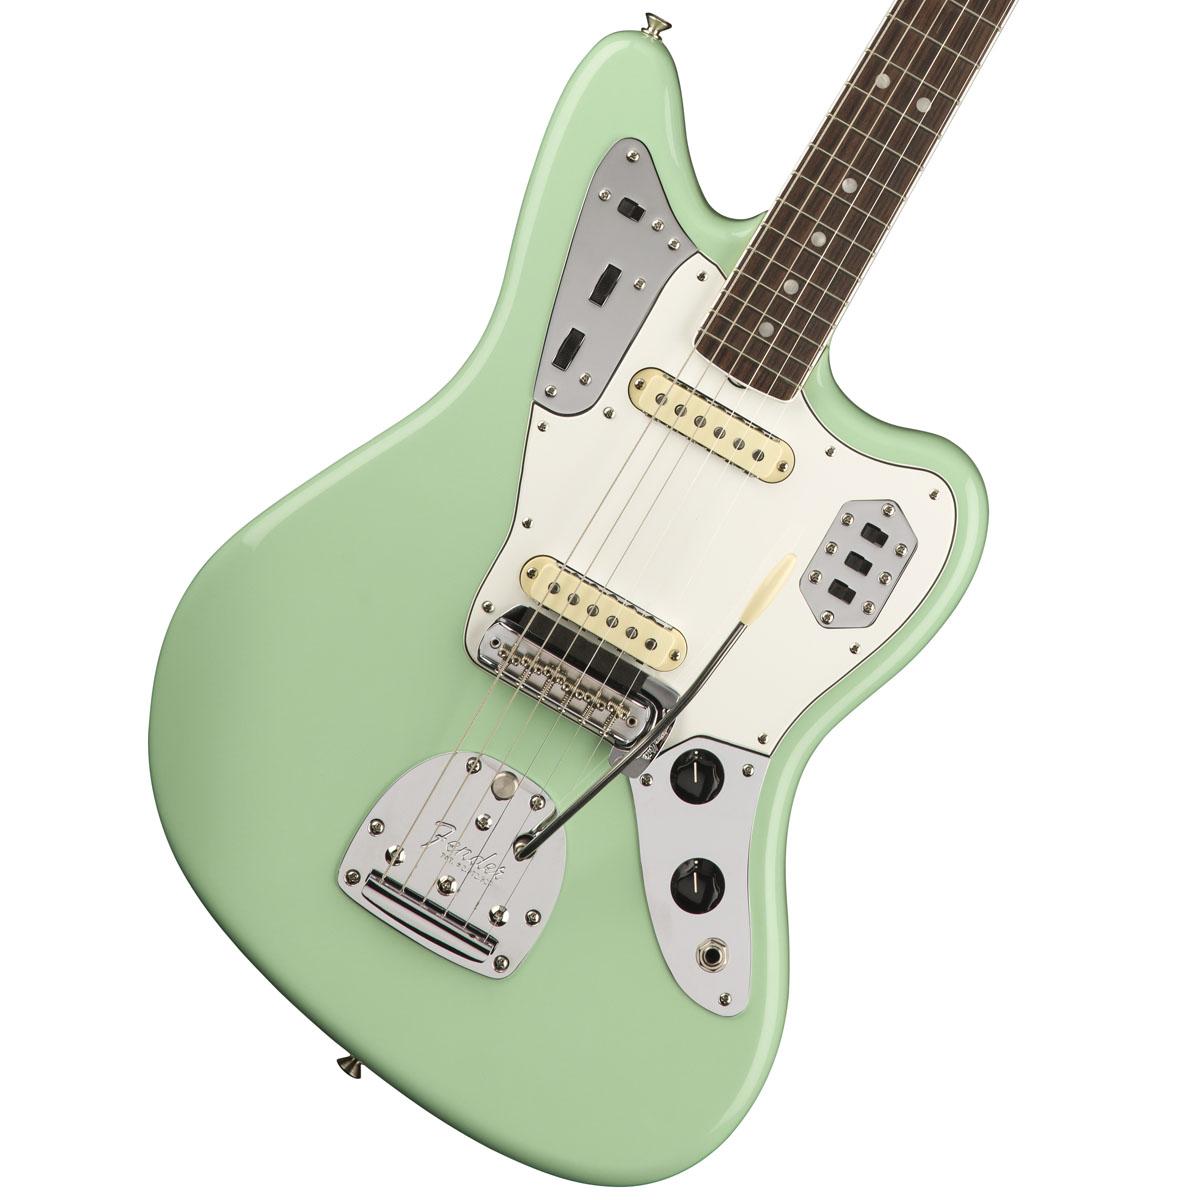 Fender USA / American Original 60s Jaguar Surf Green 《カスタムショップのお手入れ用品を進呈/+671038200》《フェンダー純正グッズを進呈/+79083》